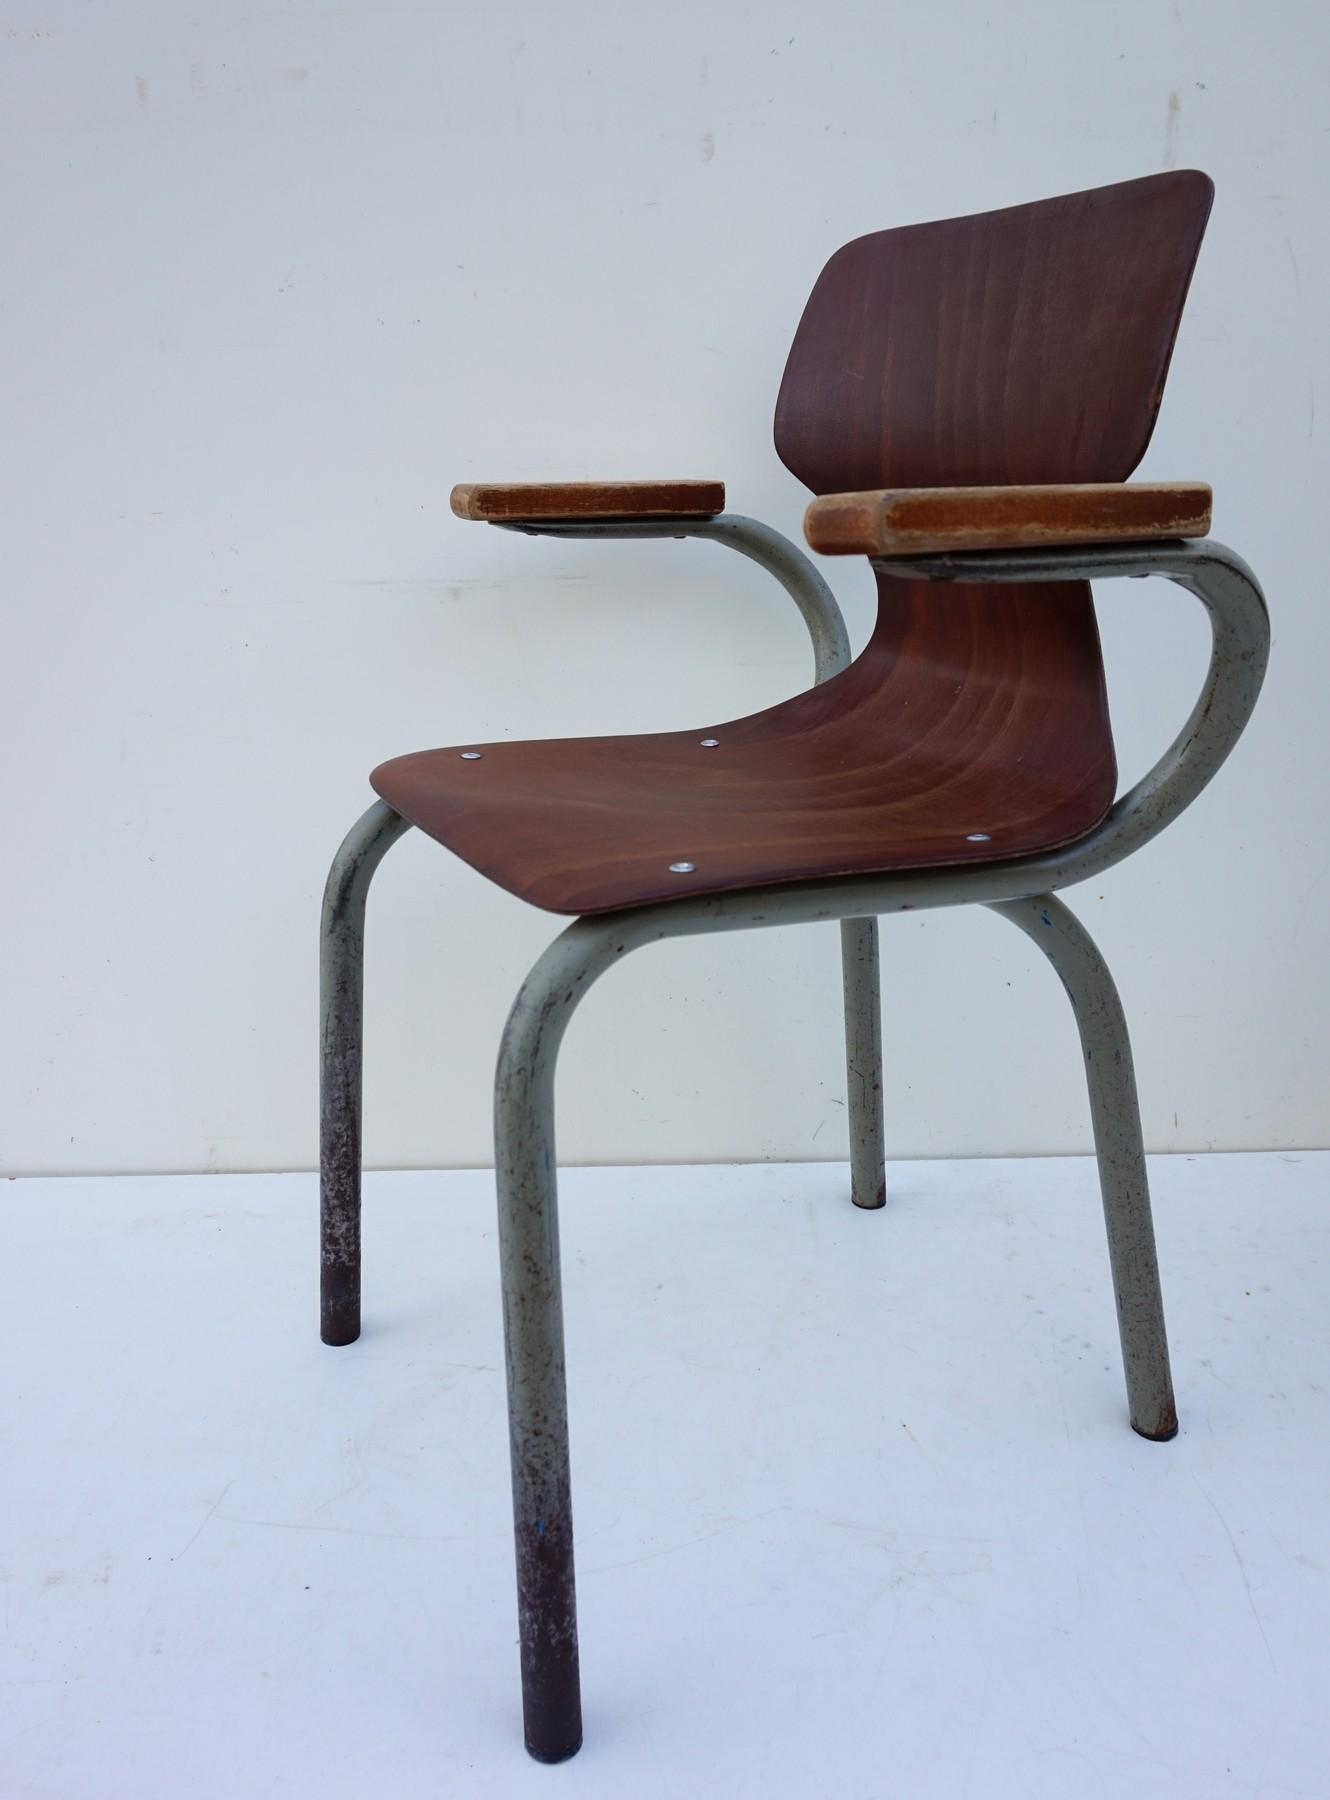 Industrieel Design Vintage.Vintage Pagholz Children Chairs Tubax